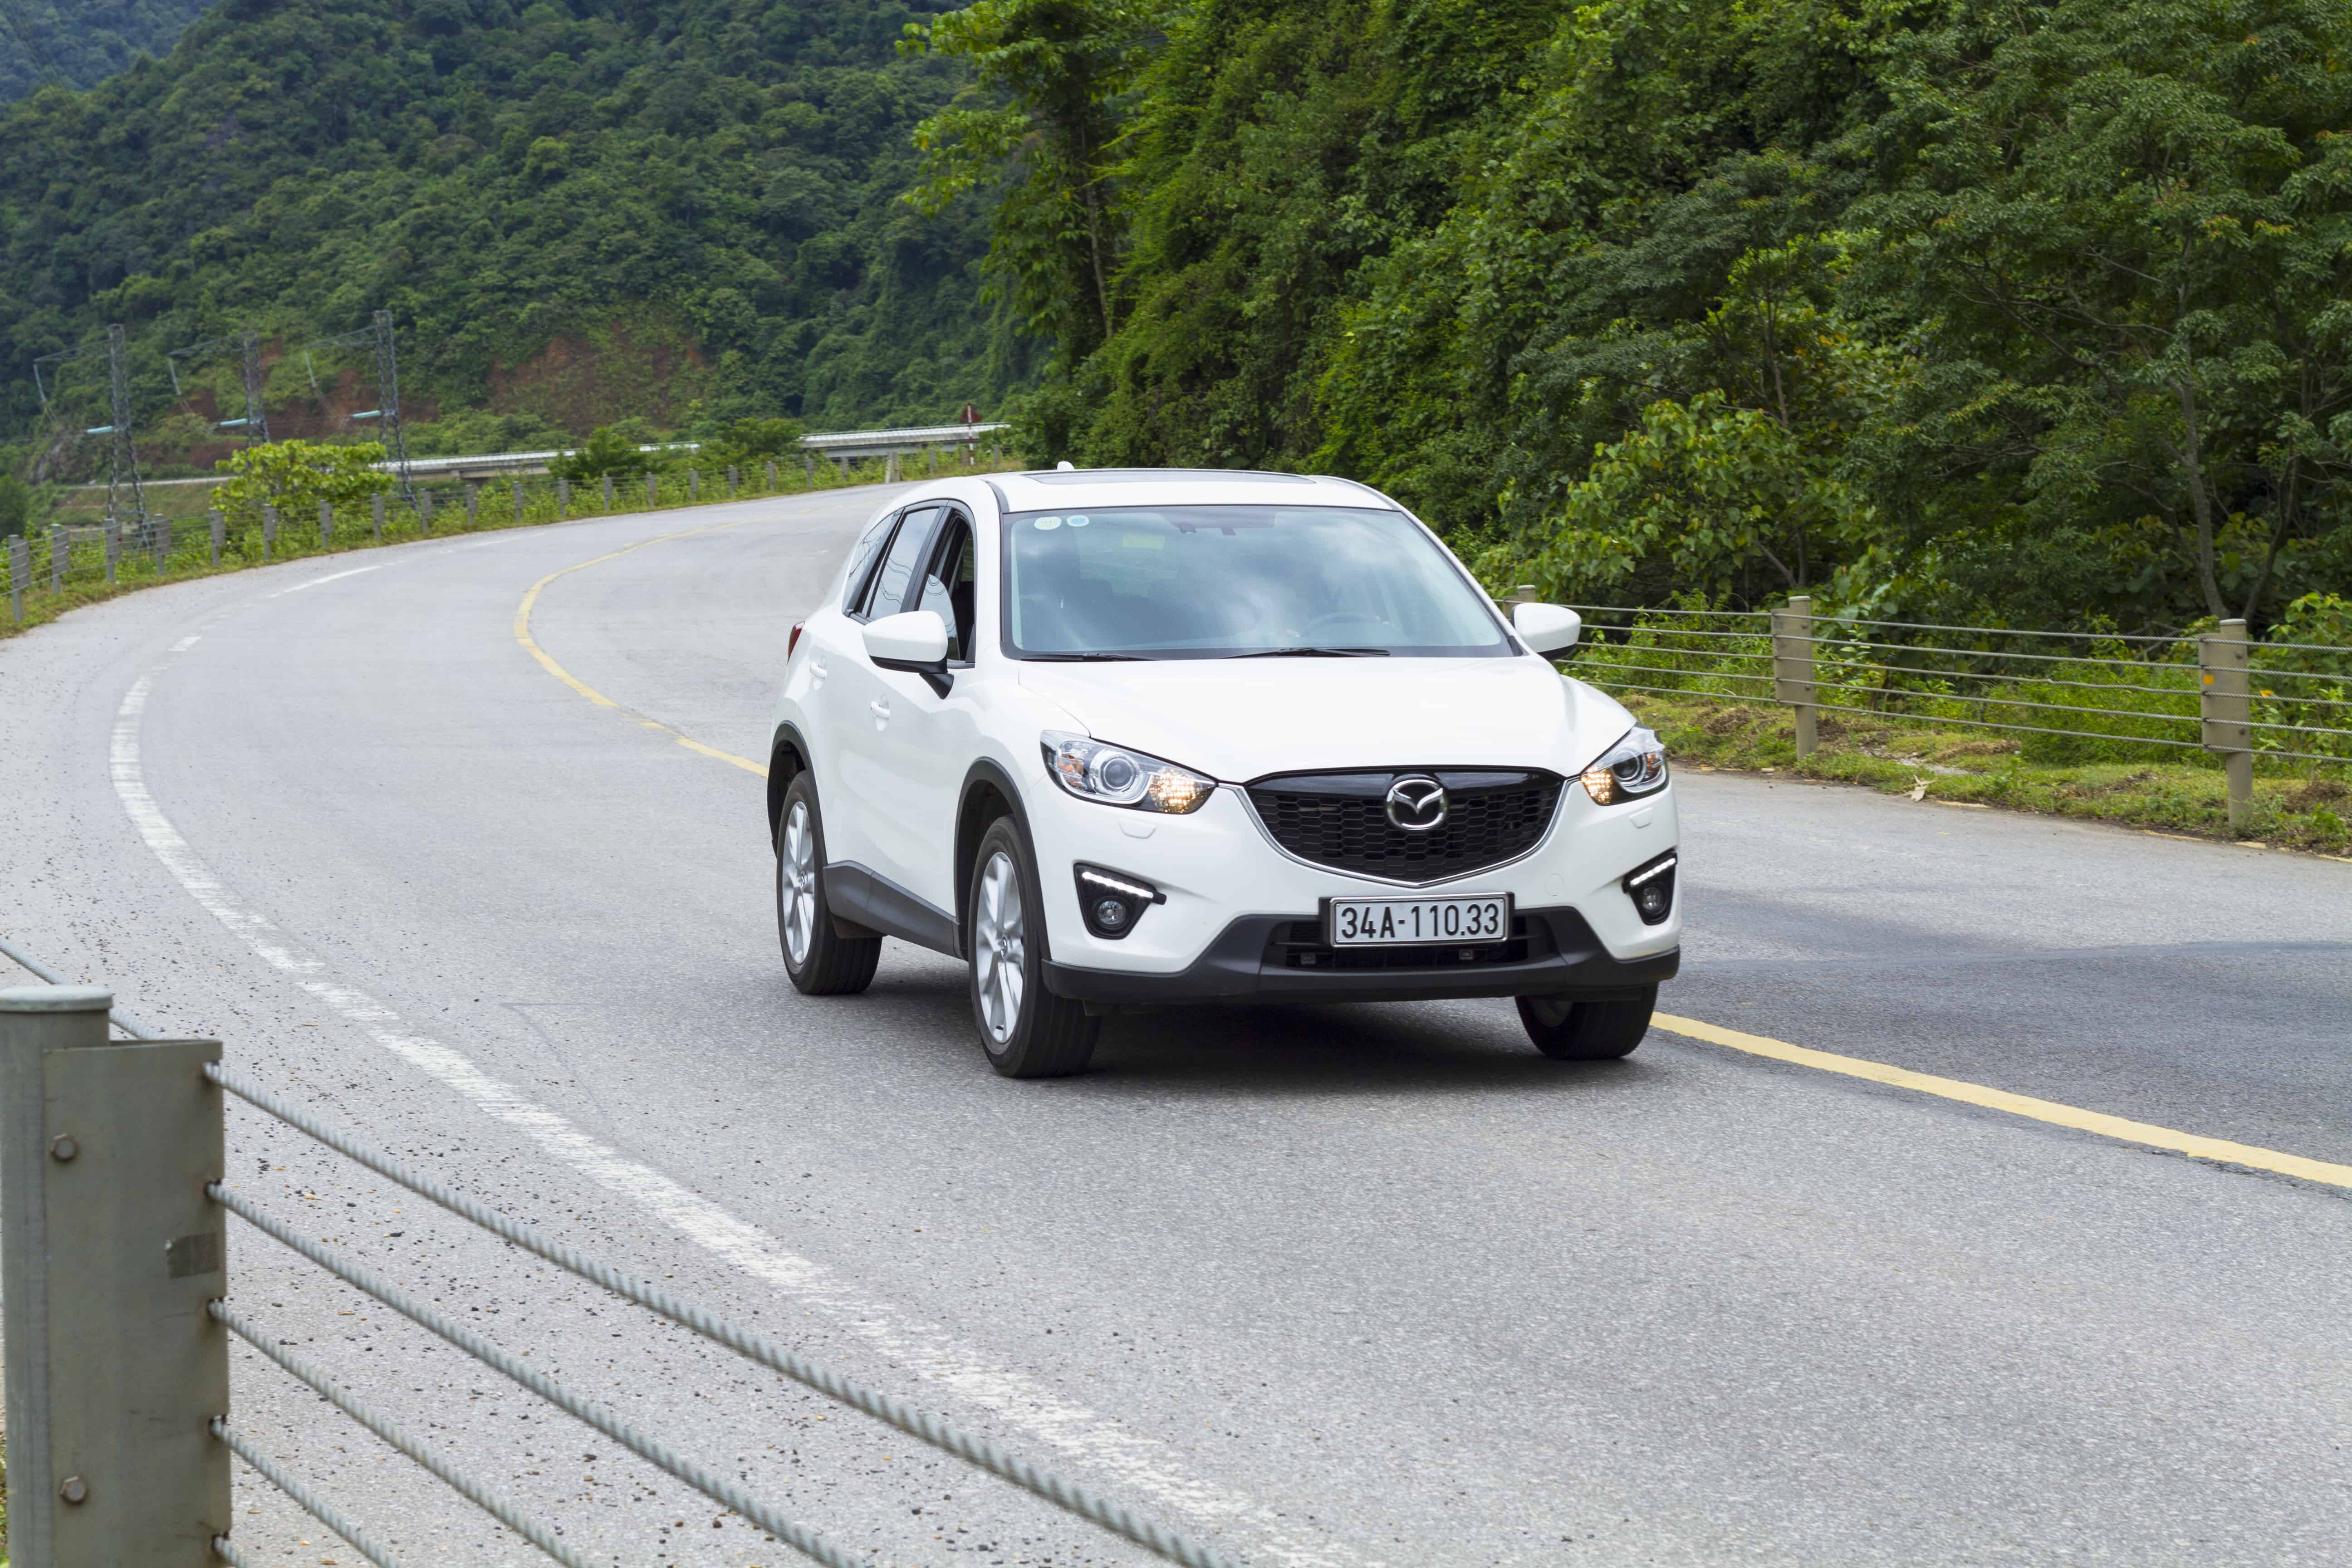 Mazda Daytime Running Headlights May Not Turn On